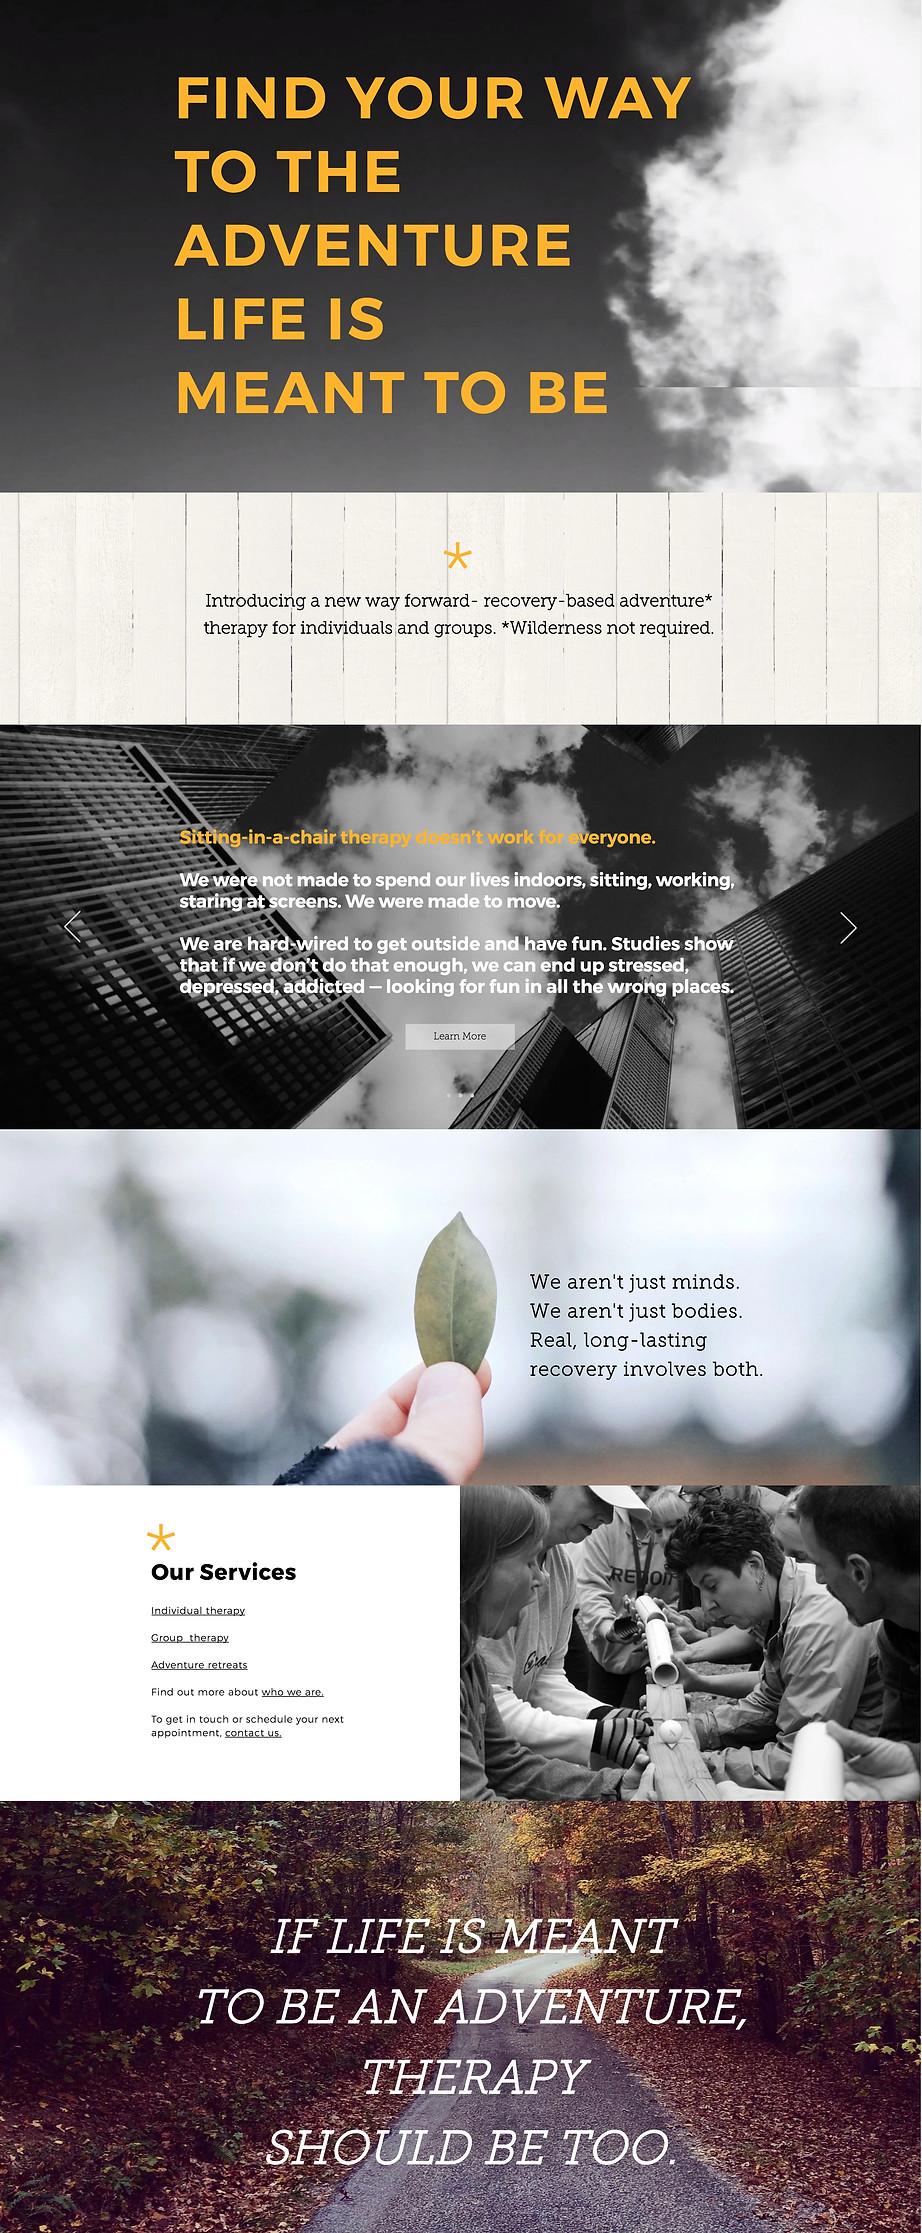 Adventure Forward, Web Design, Website, Website Design, Branding, Brand Identity, Logo Design, Logo, Marketing, Advertising, Social Media, Copywriting, Design, Graphic Design, Social Media Marketing, Digital Marketing